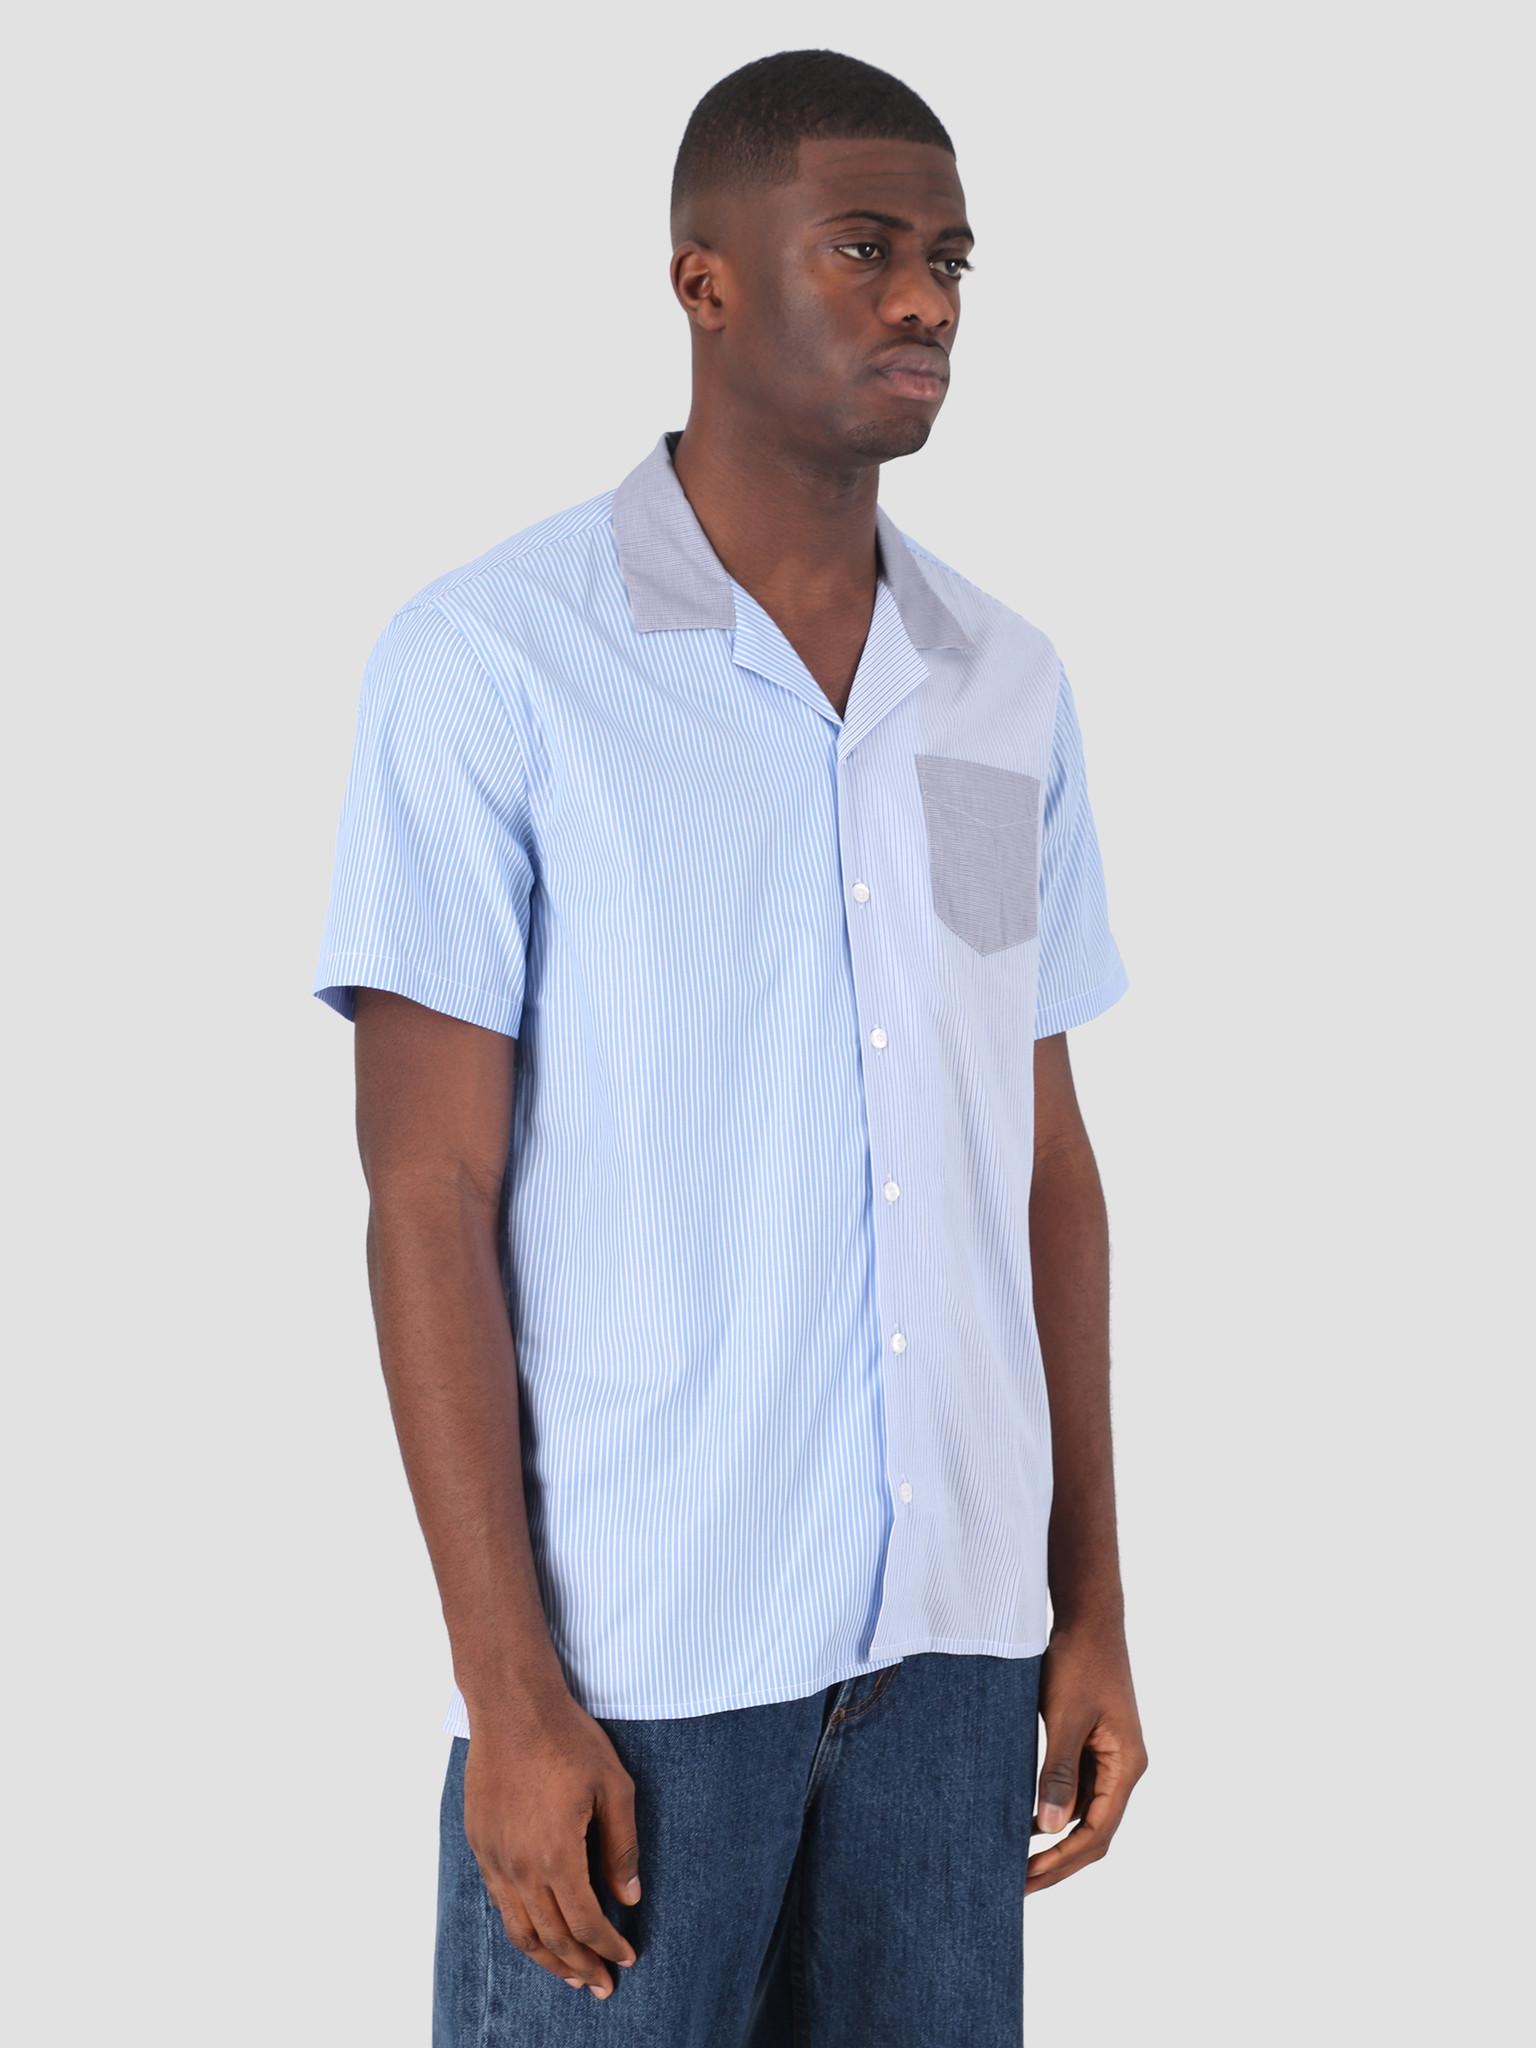 Libertine Libertine Libertine Libertine Cave S/S Dress Shirt Stripe Mix 02 1790